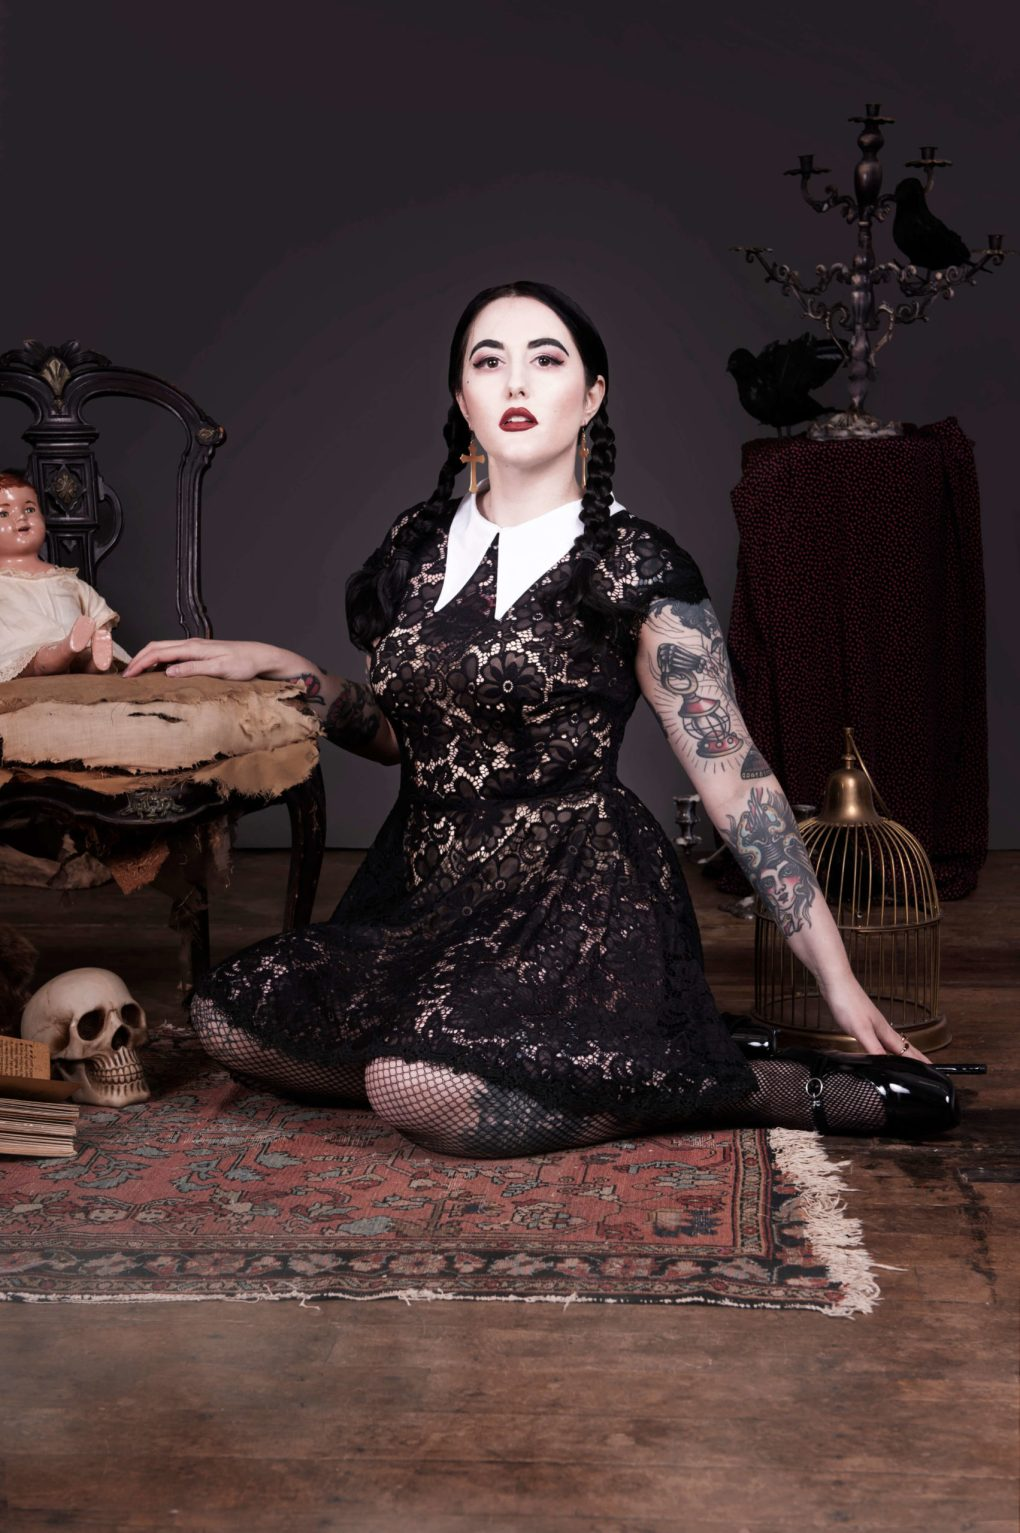 Wednesday Addams inspired dress